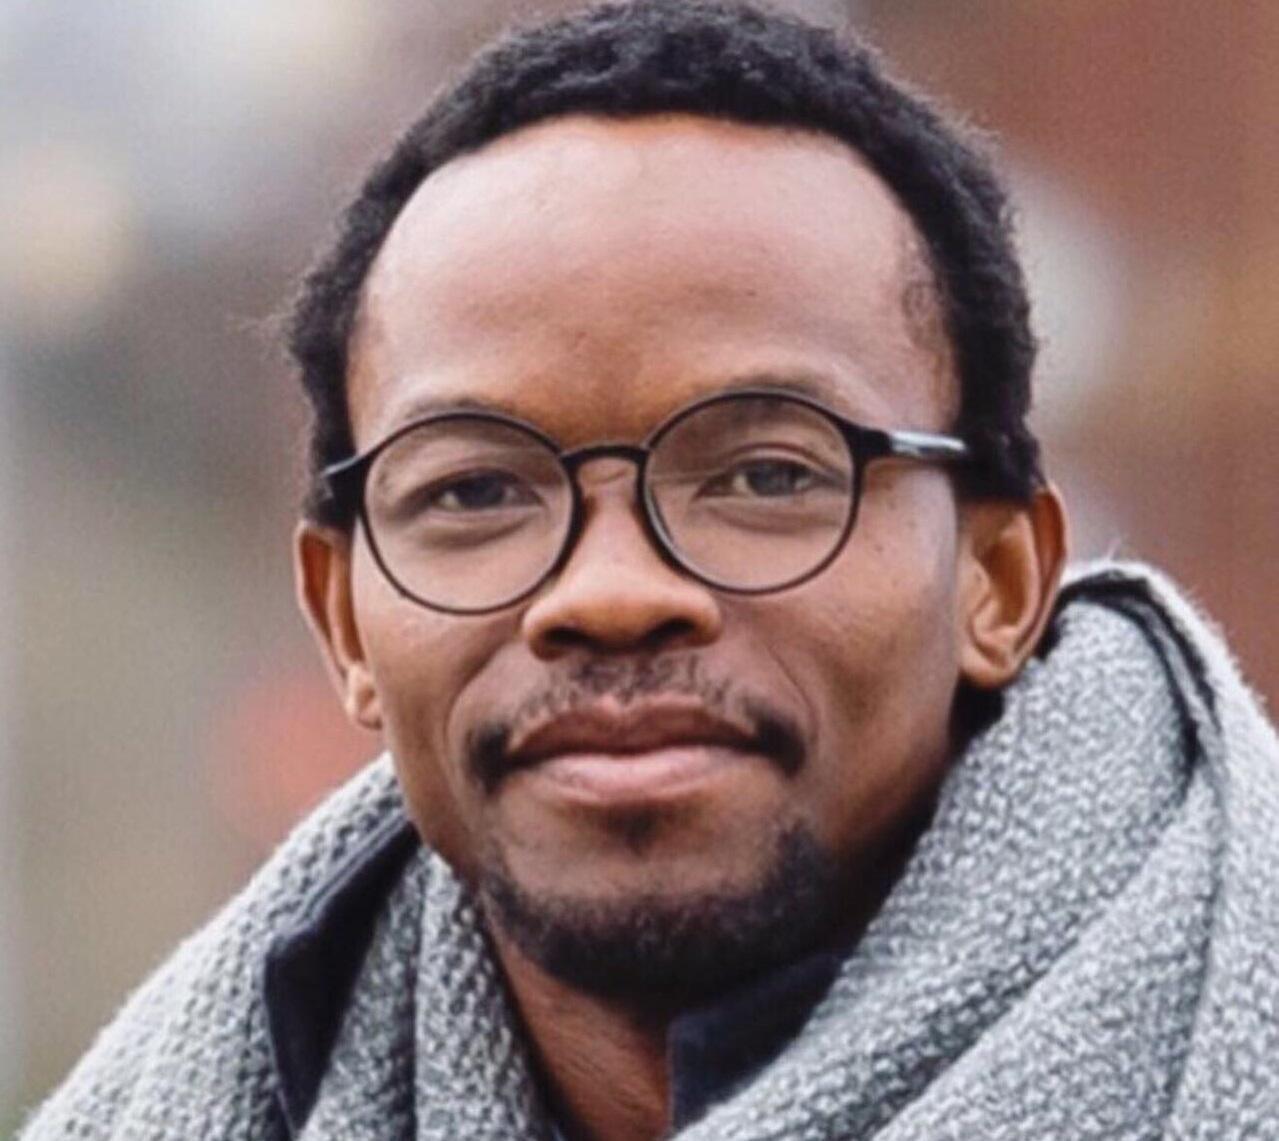 Realizador moçambicano, Inadelso Cossa